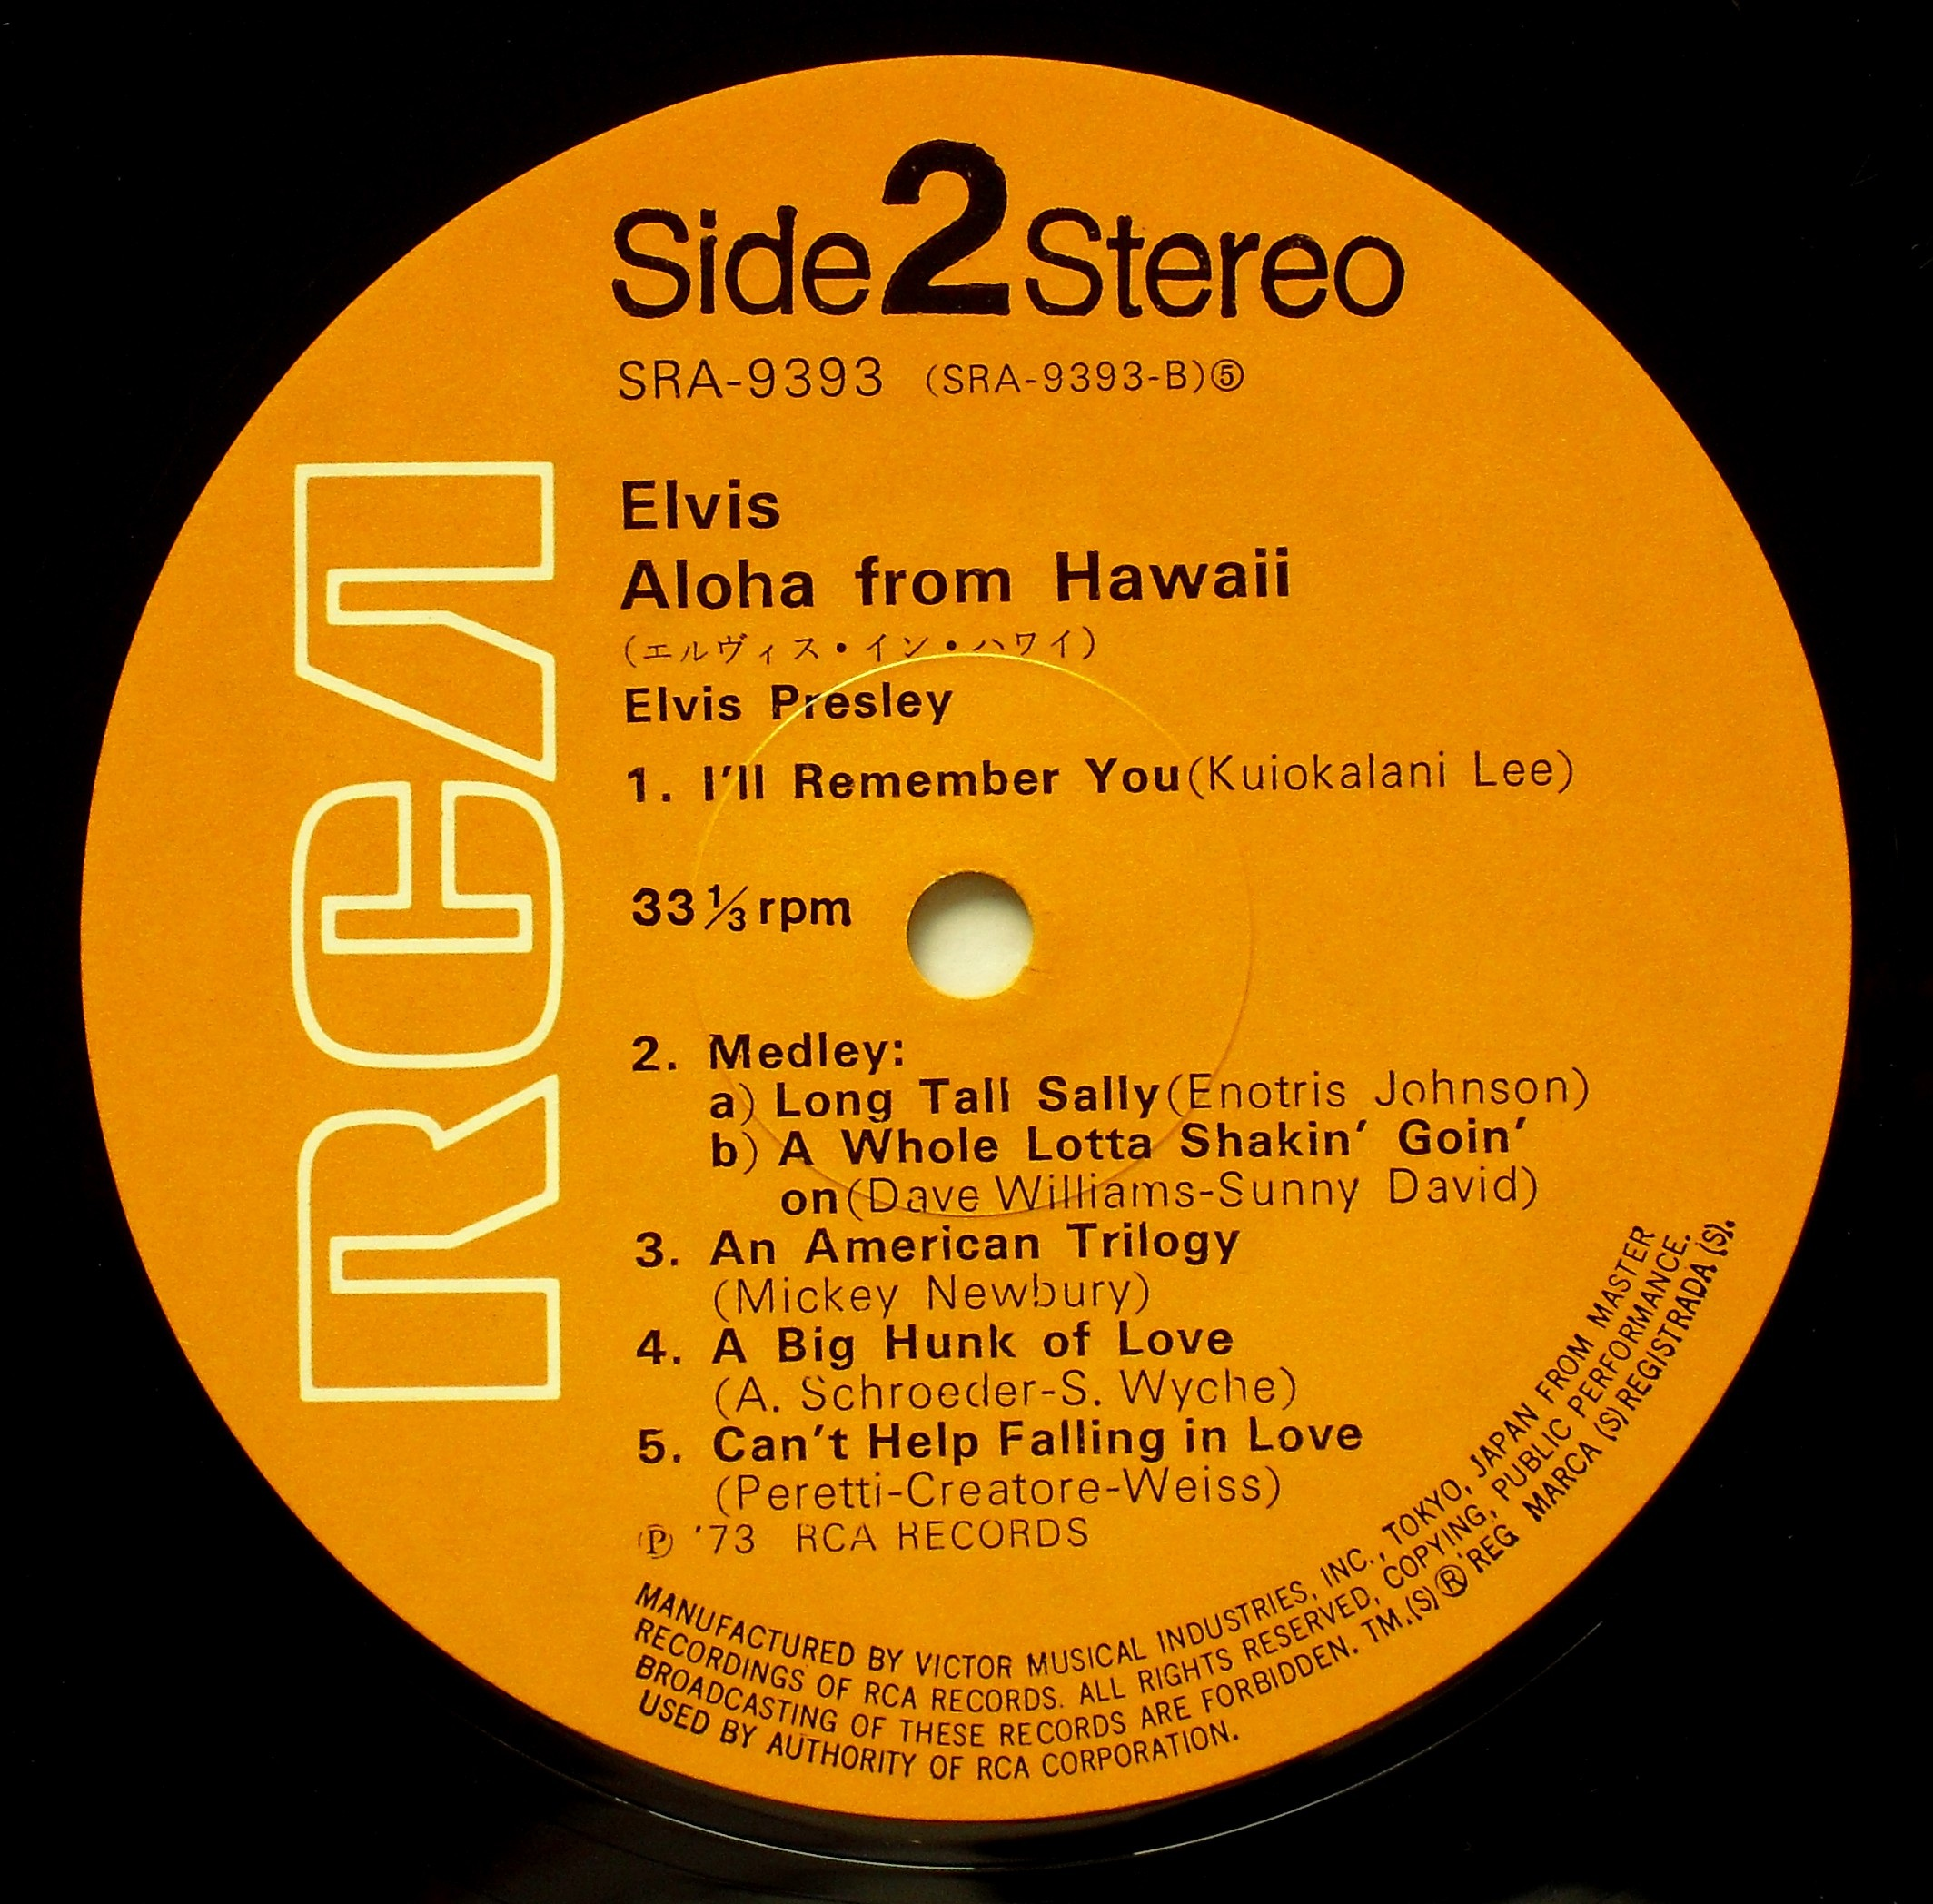 ALOHA FROM HAWAII VIA SATELLITE 04s4rnodv